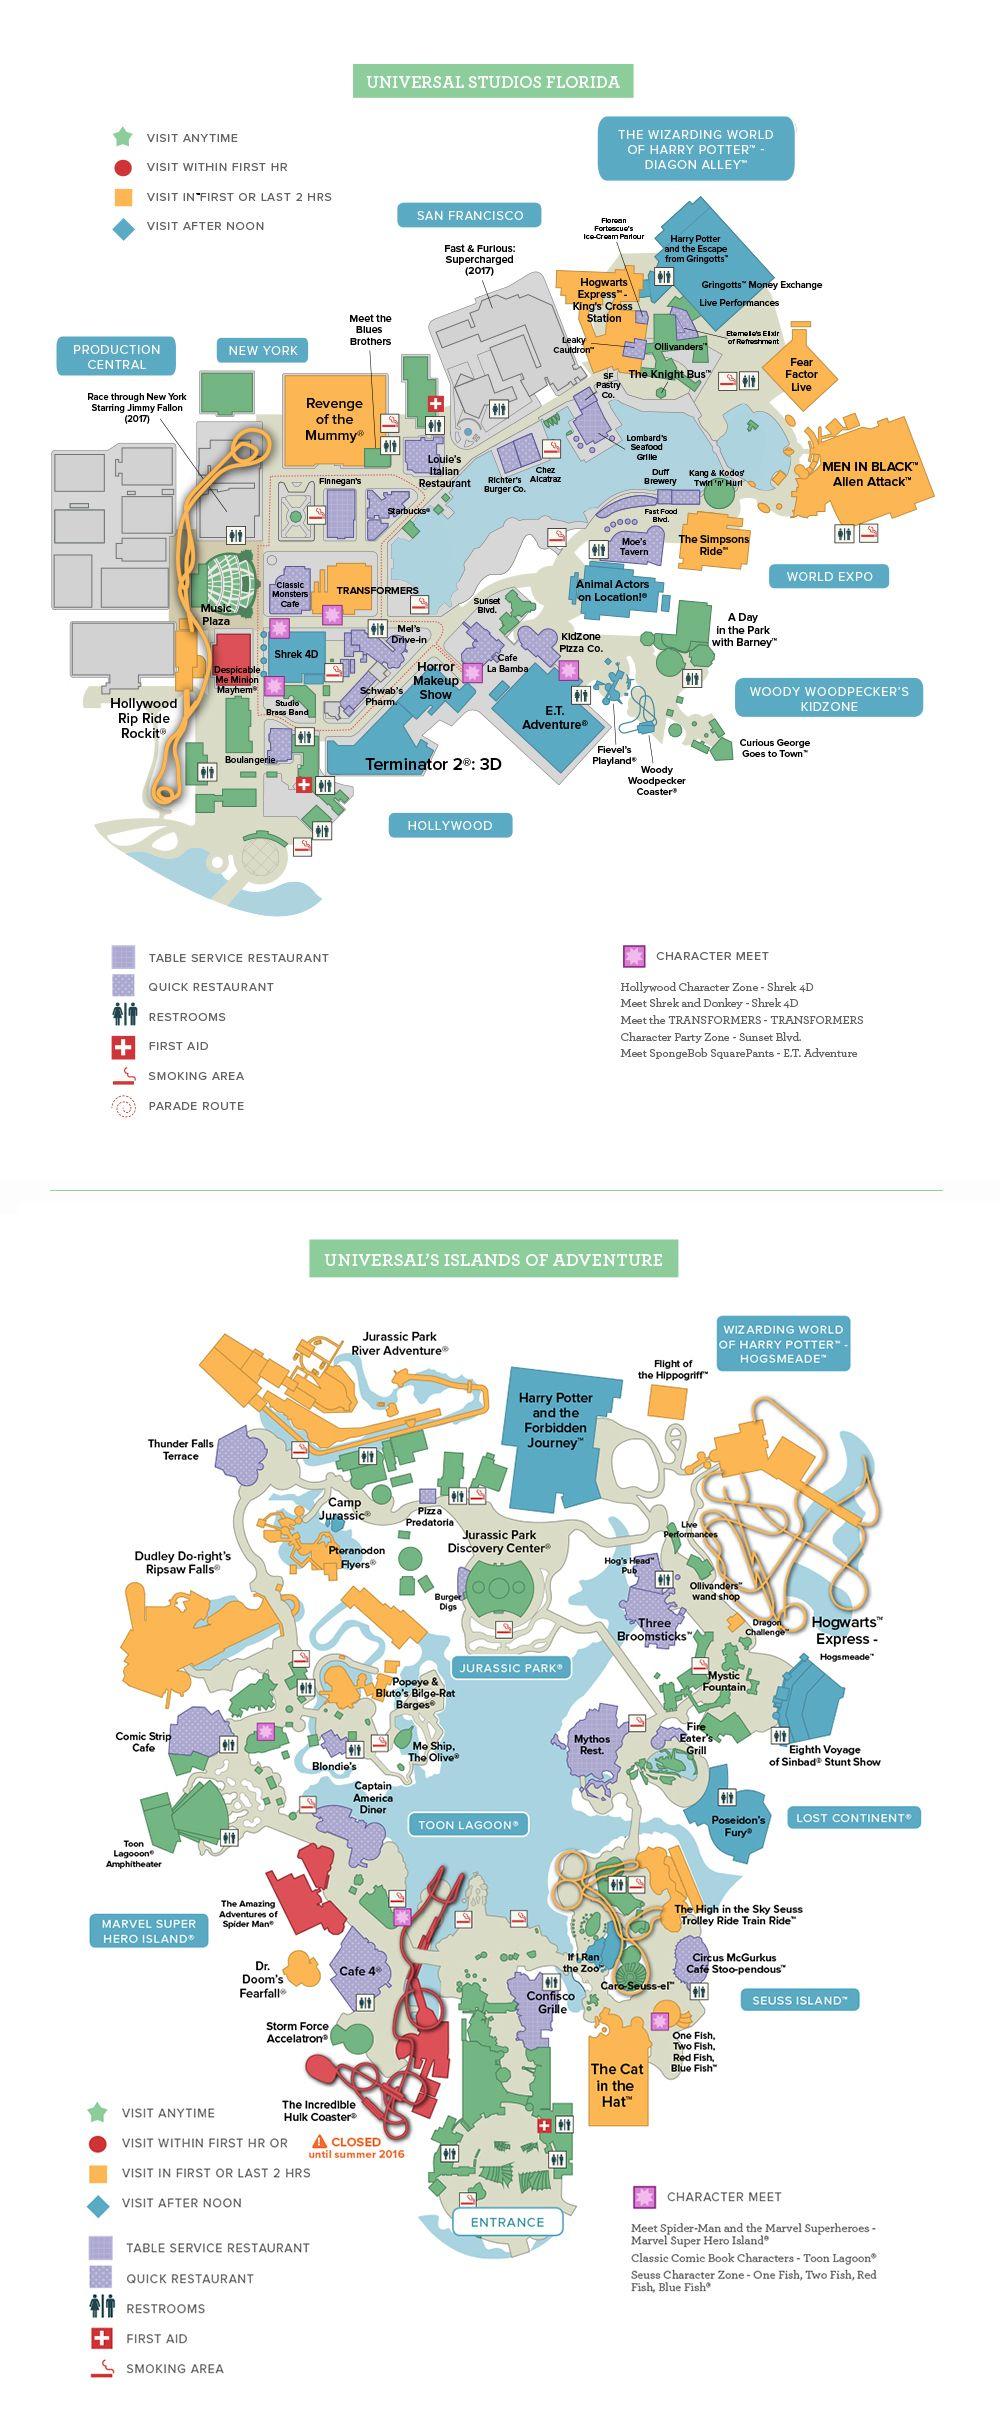 Universals Islands of Adventure General Map travel Pinterest